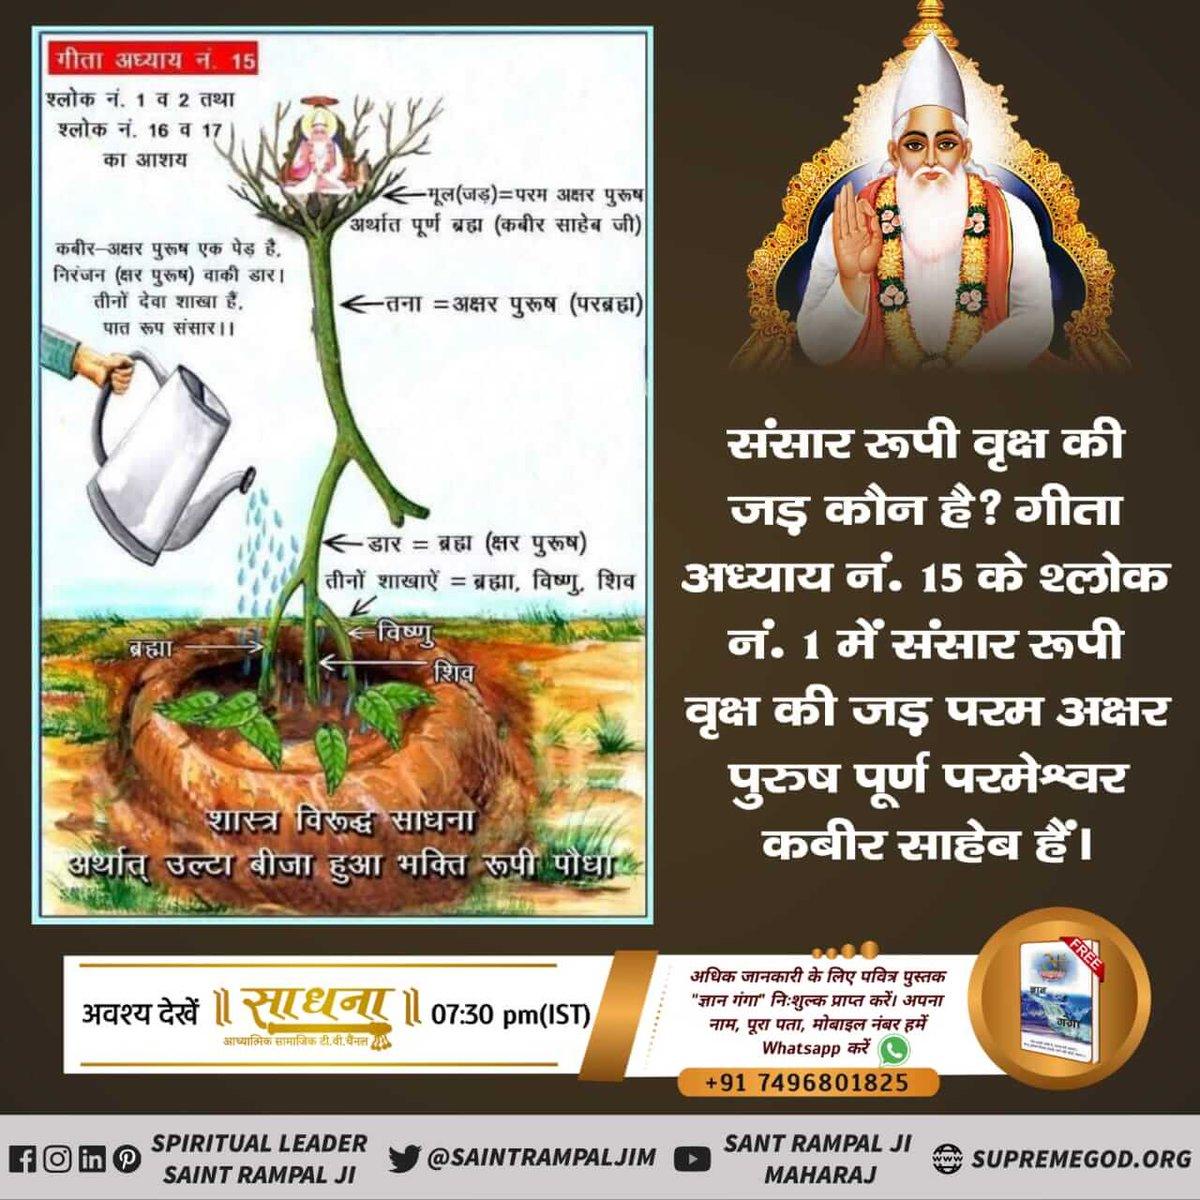 #HappinessMantra #WhoCreatedNature God Kabir Kabir Sahib, the Supreme God, created all beings.  Created the whole universe.  God Kabir is the Master of SATLOK https://t.co/Qi6mdPOcqV